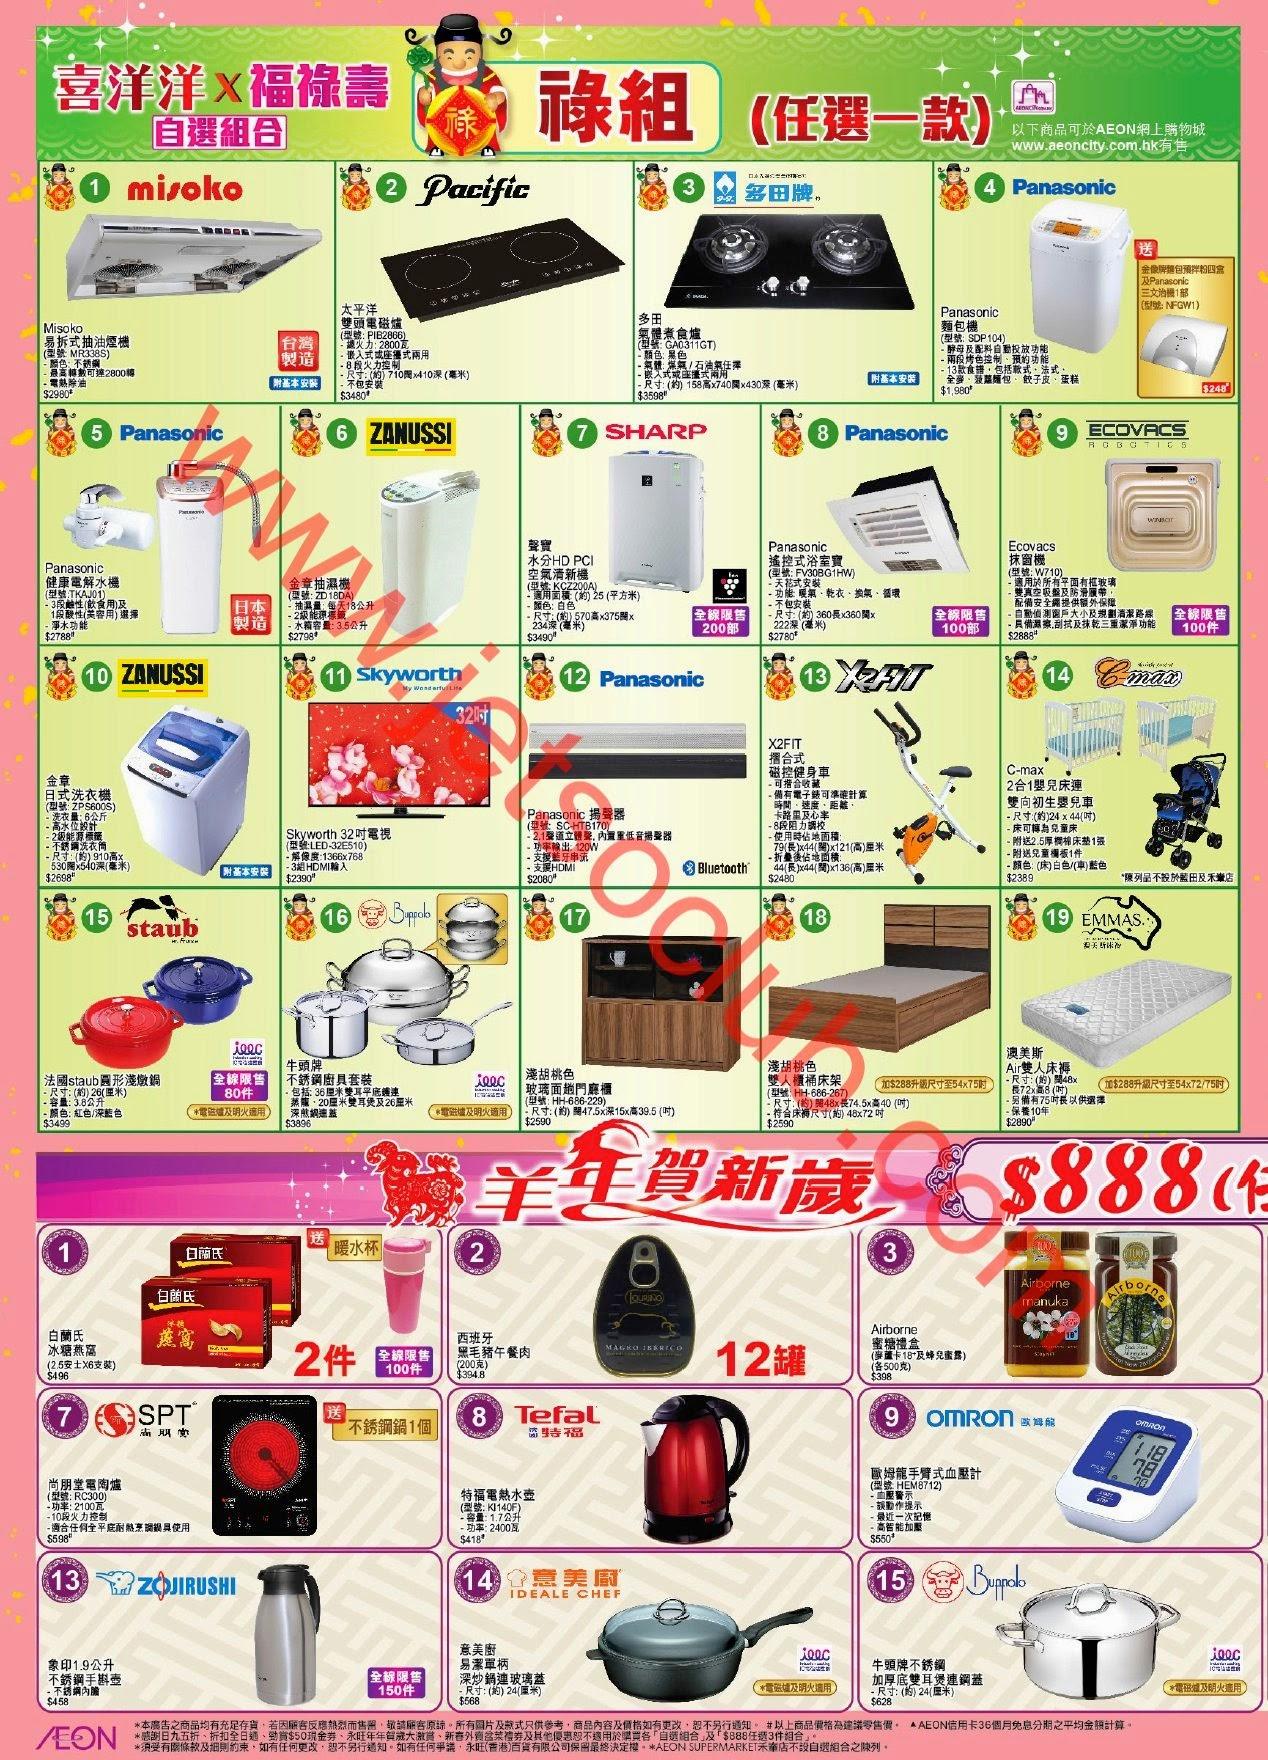 AEON:喜洋洋 x 福祿壽自選組合(5-24/2) ( Jetso Club 著數俱樂部 )